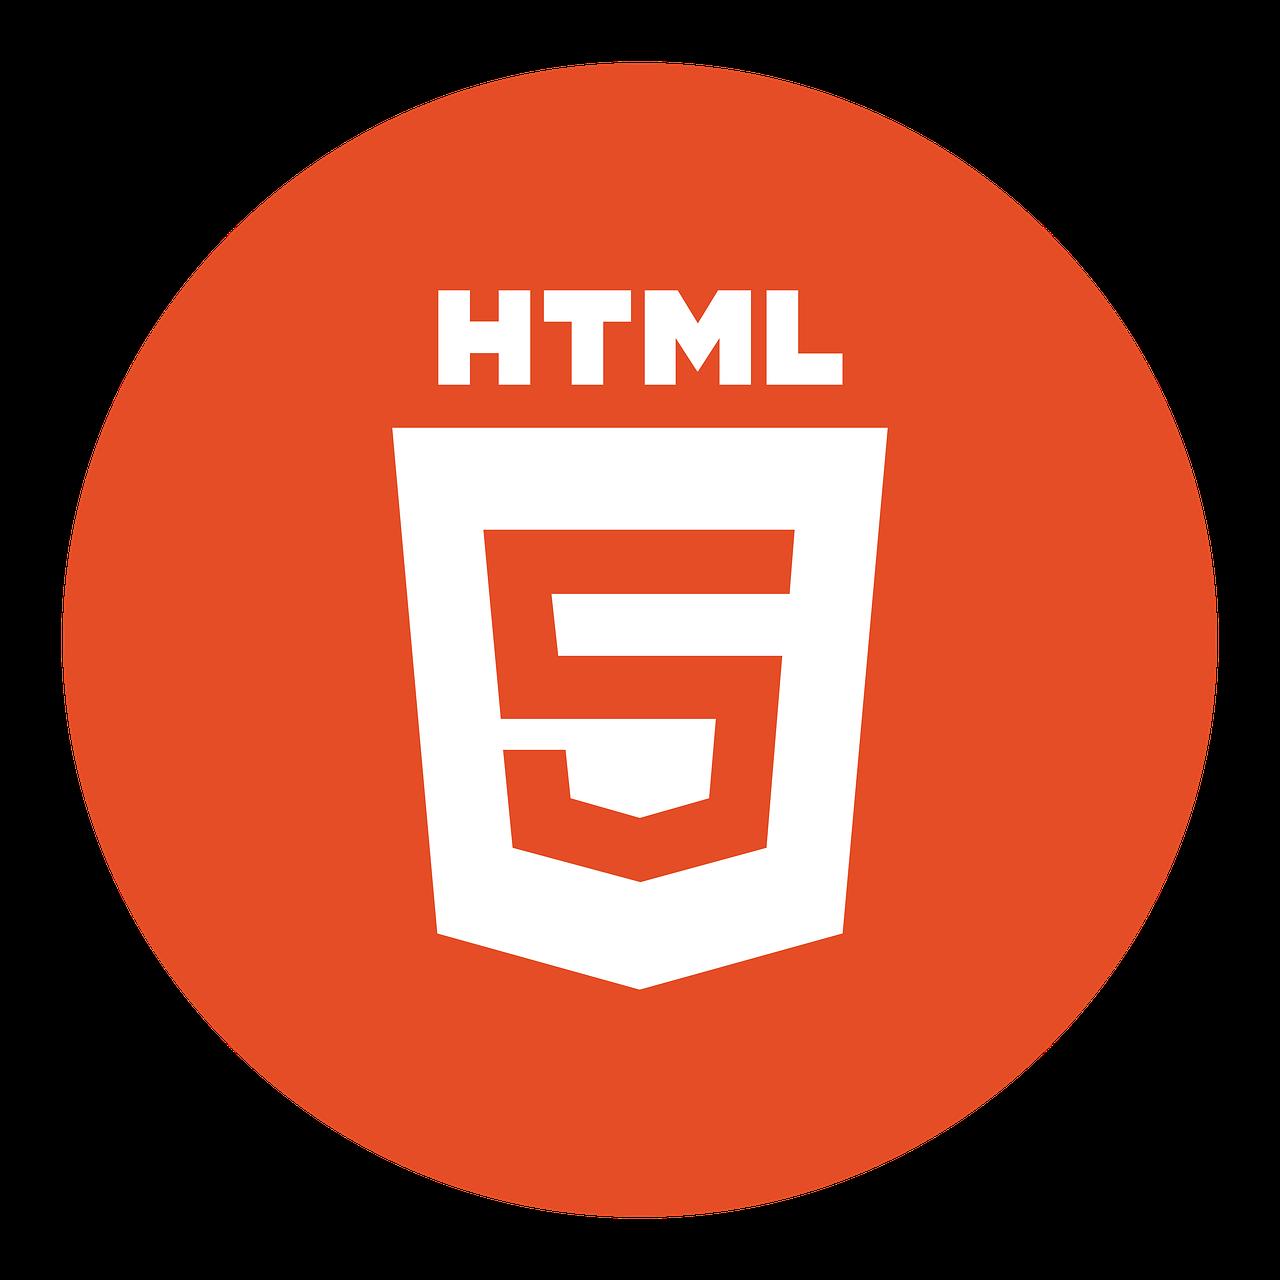 HTML 5 Logo. Source: Pixabay